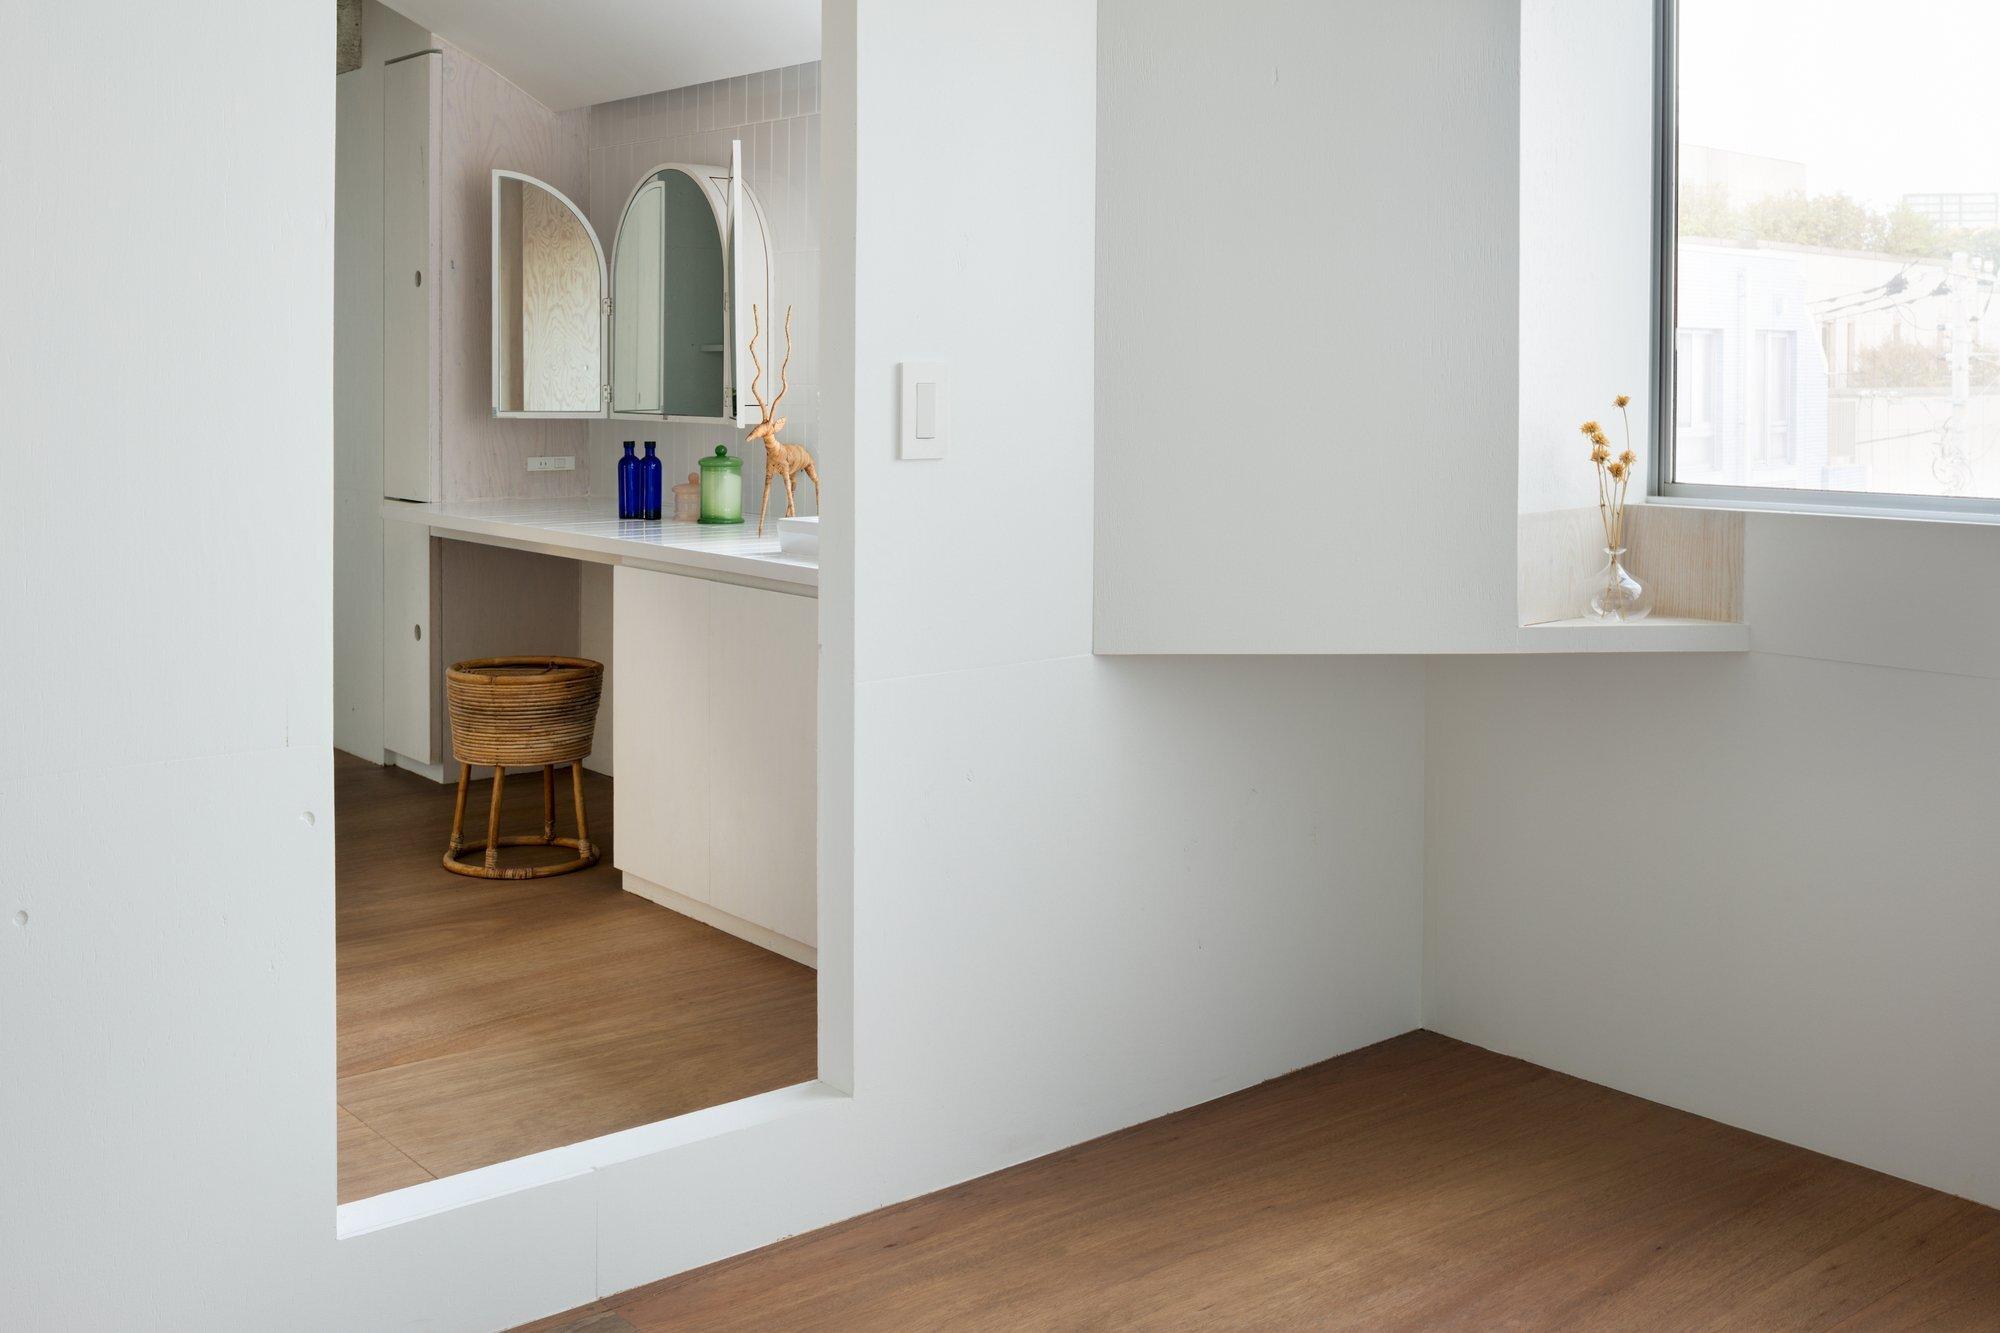 Team Living House - Masatoshi Hirai Architects Atelier - Tokyo - Bedroom - Humble Homes